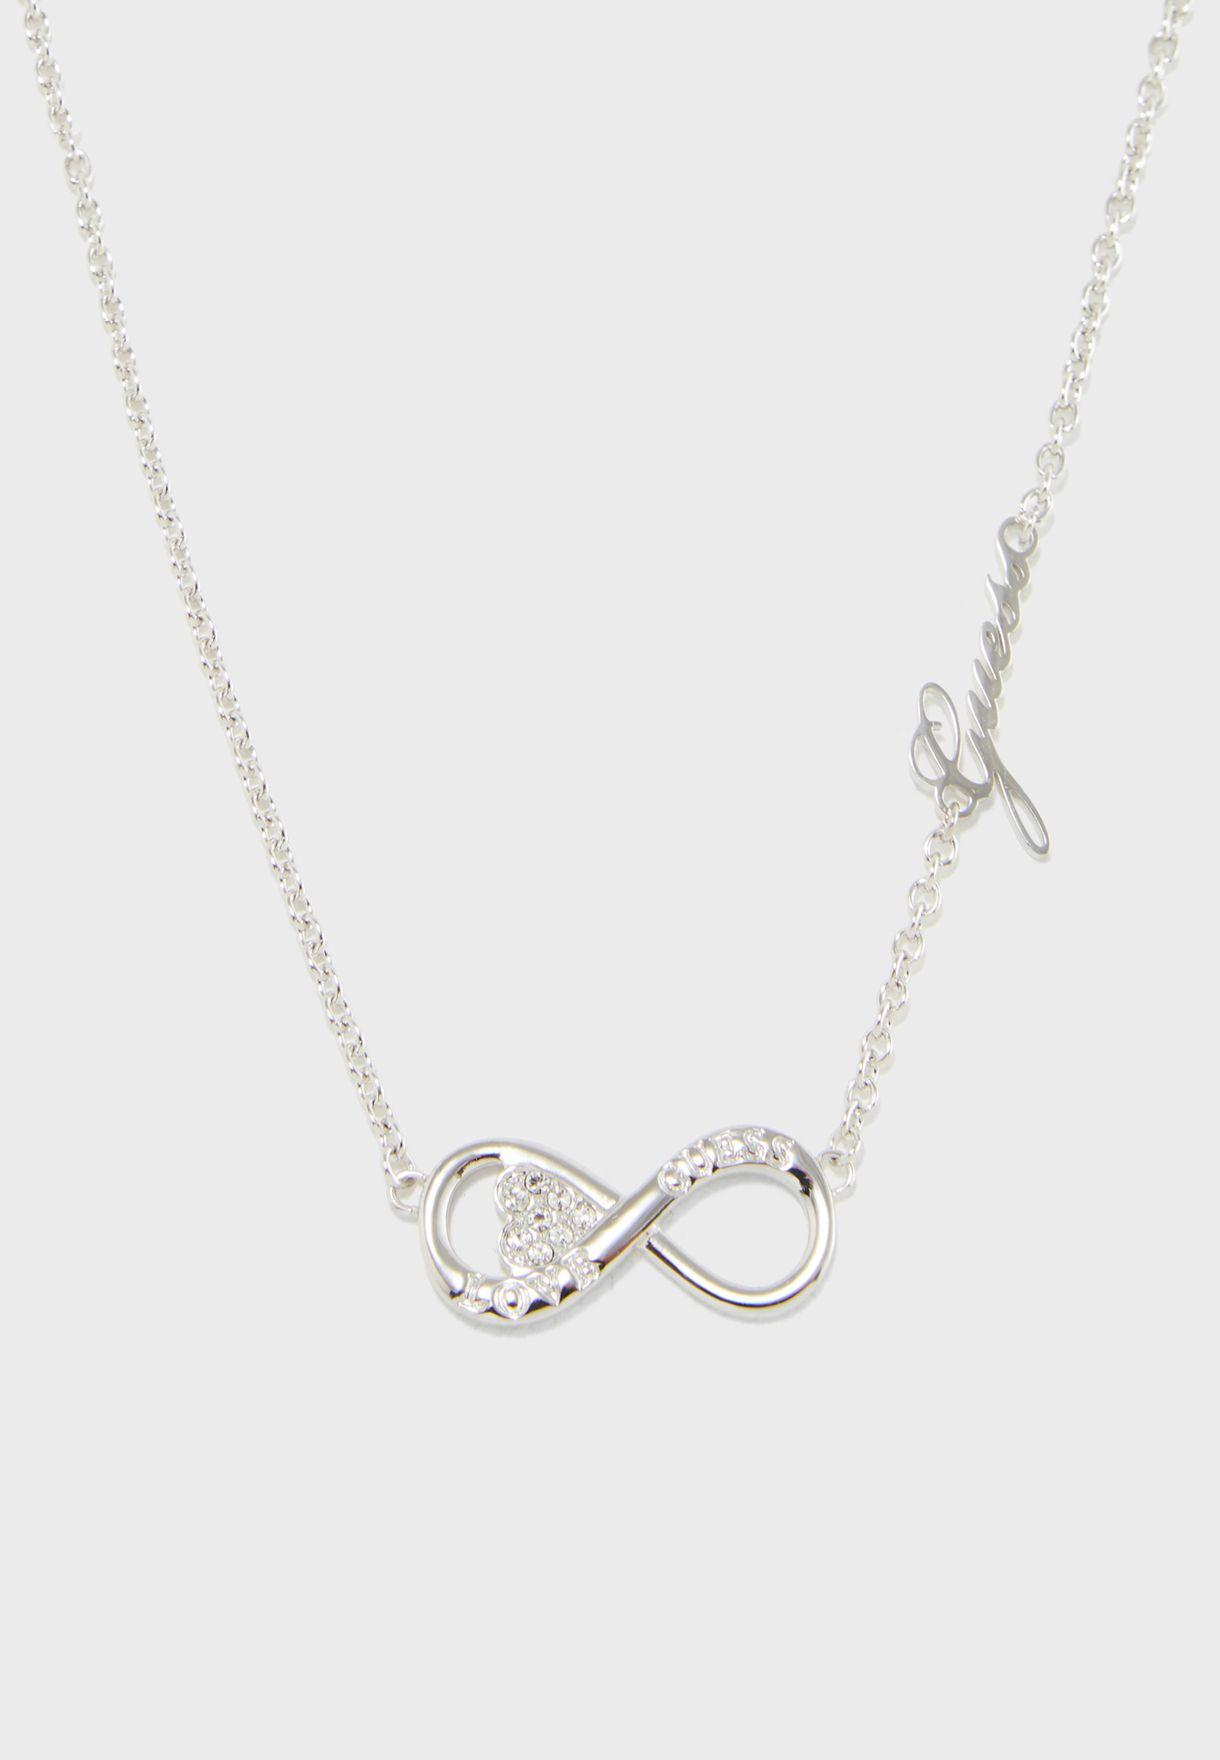 Horiz Infinity Necklace